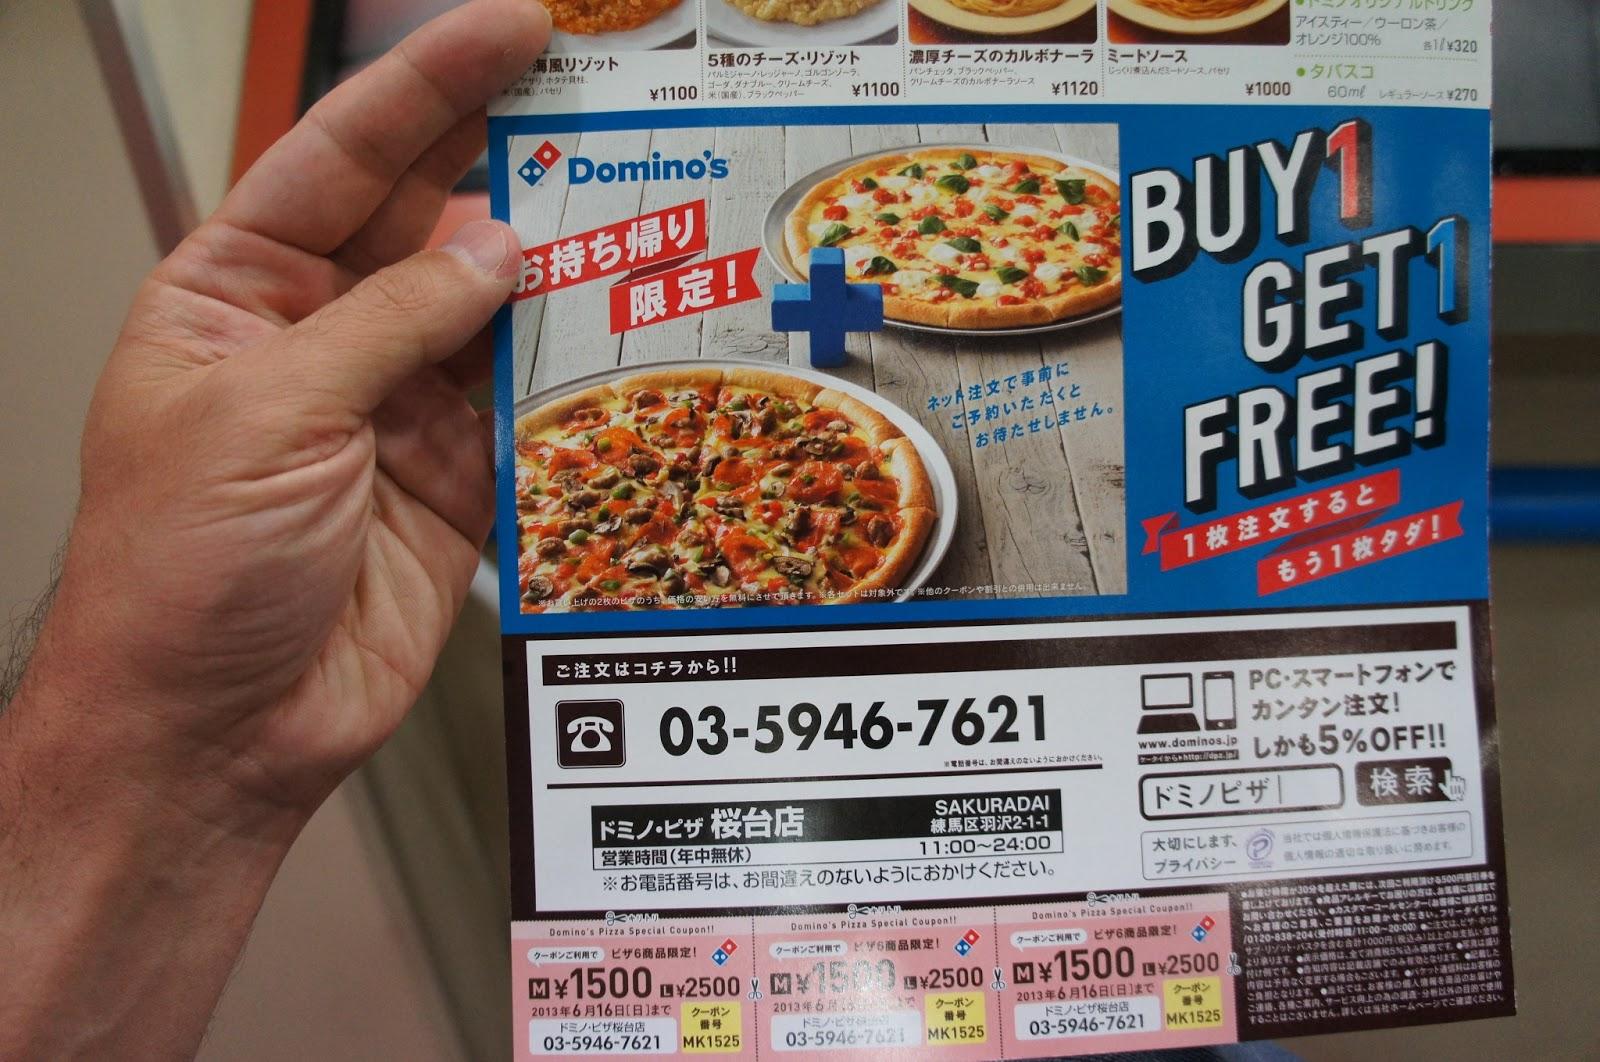 Tokyo Belly: SAKURADAI: Domino's Pizza... Buy 1 Get 1 Free!